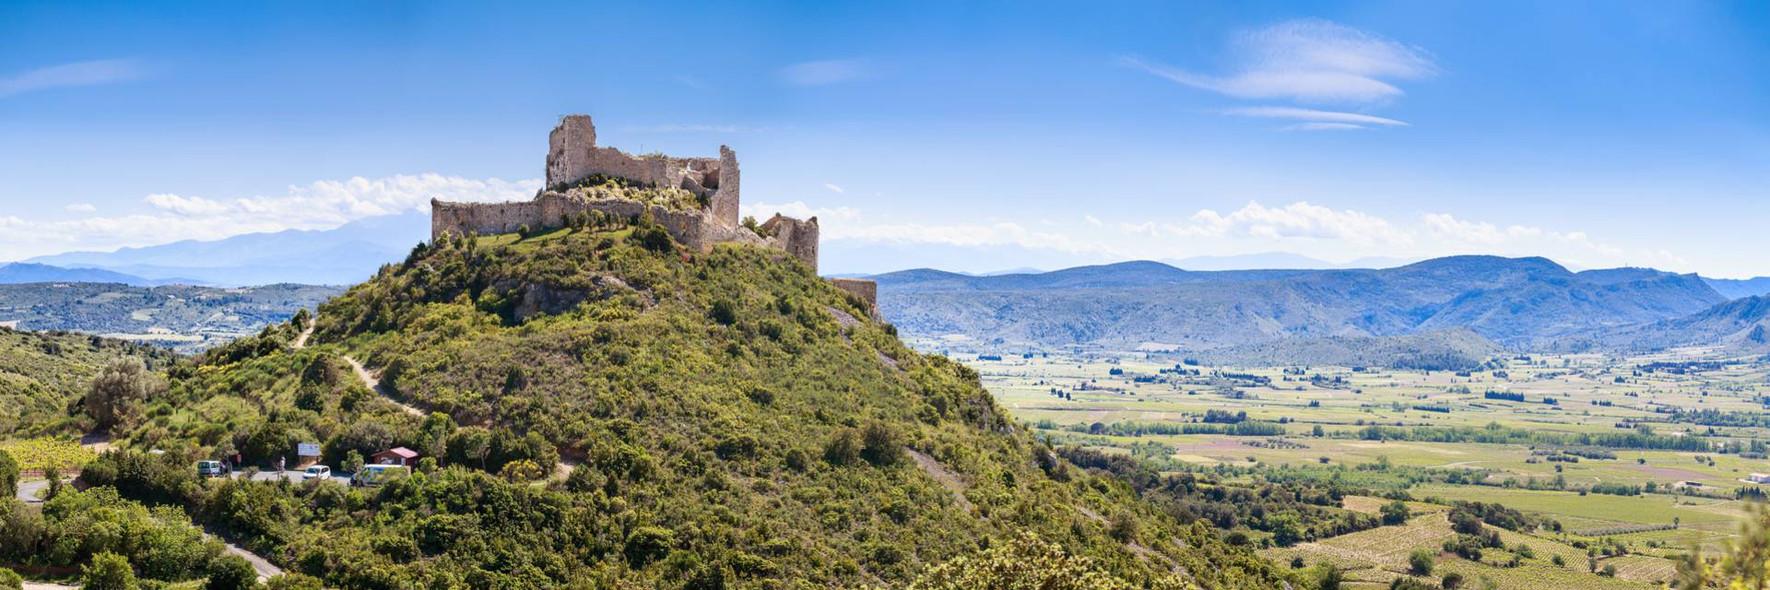 aguilar-castle-1513171075.jpg